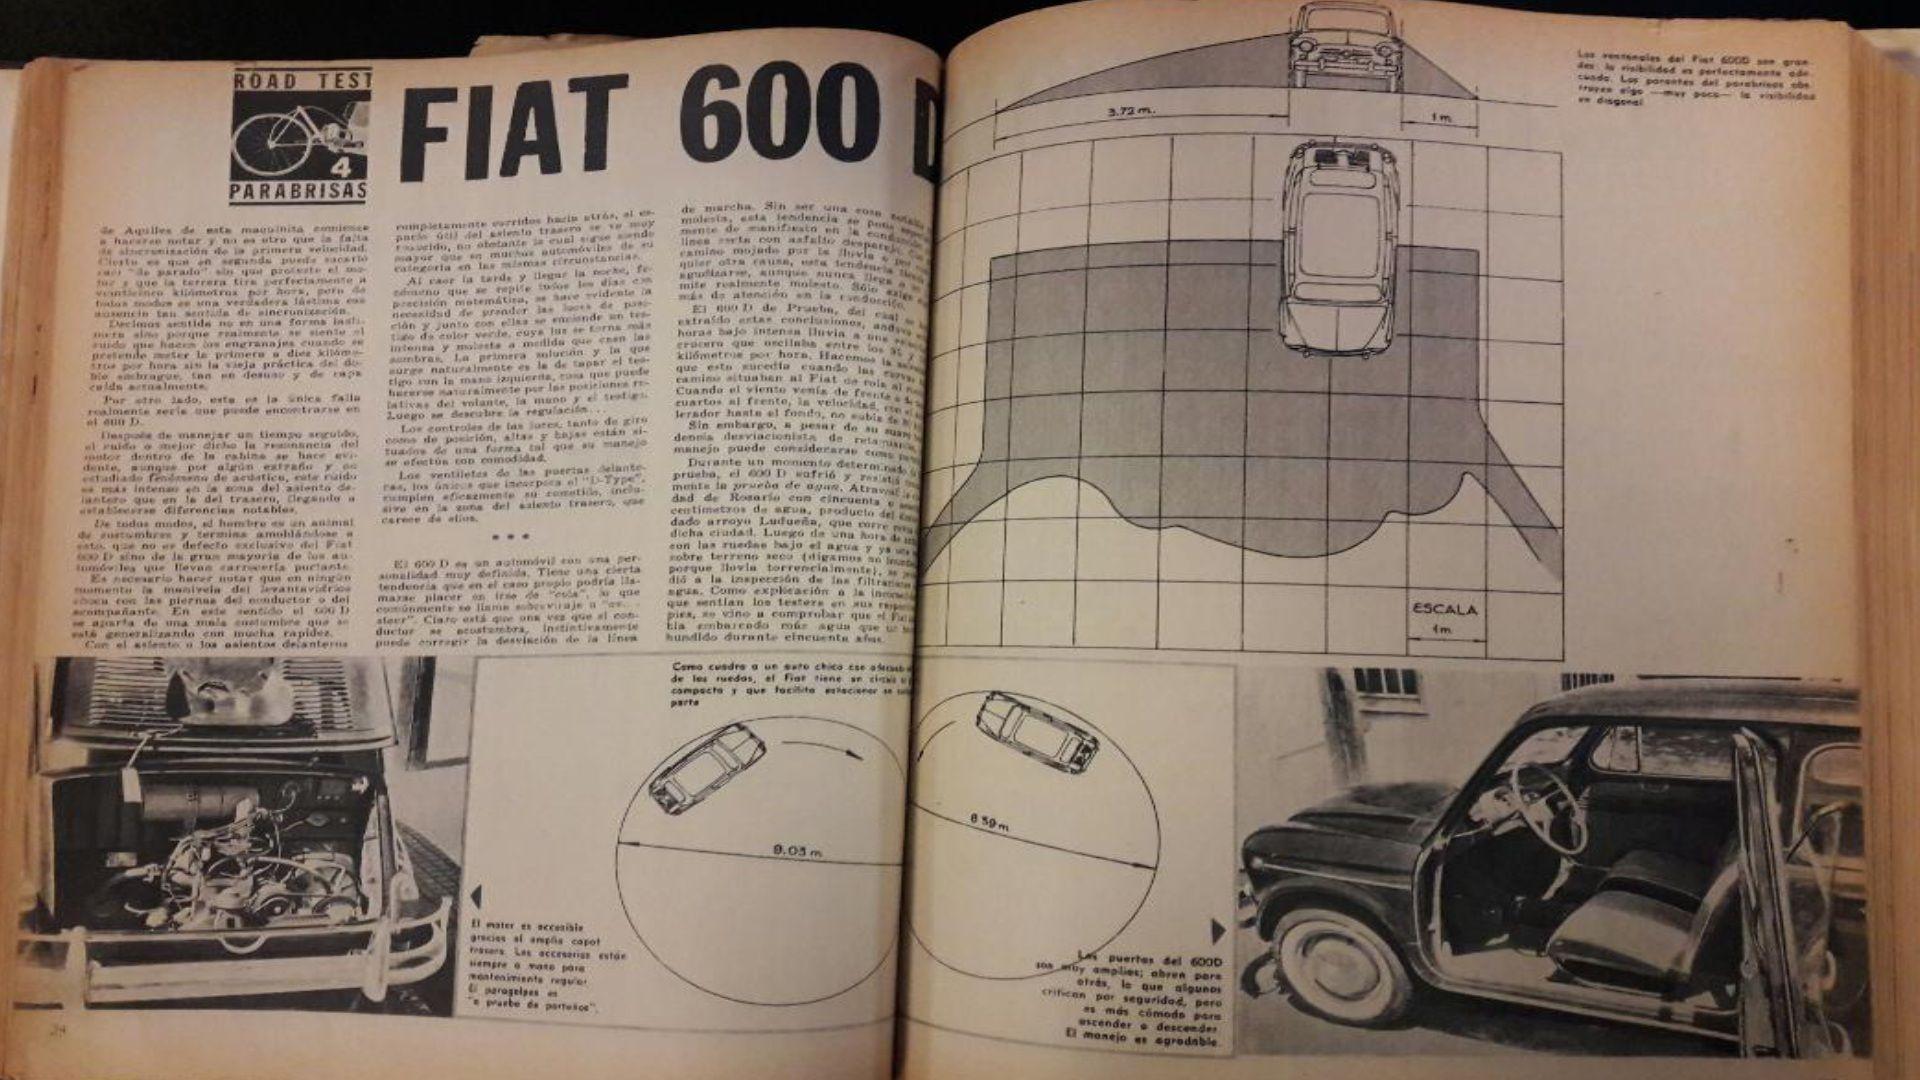 Parabrisas Asi Probabamos Al Fiat 600